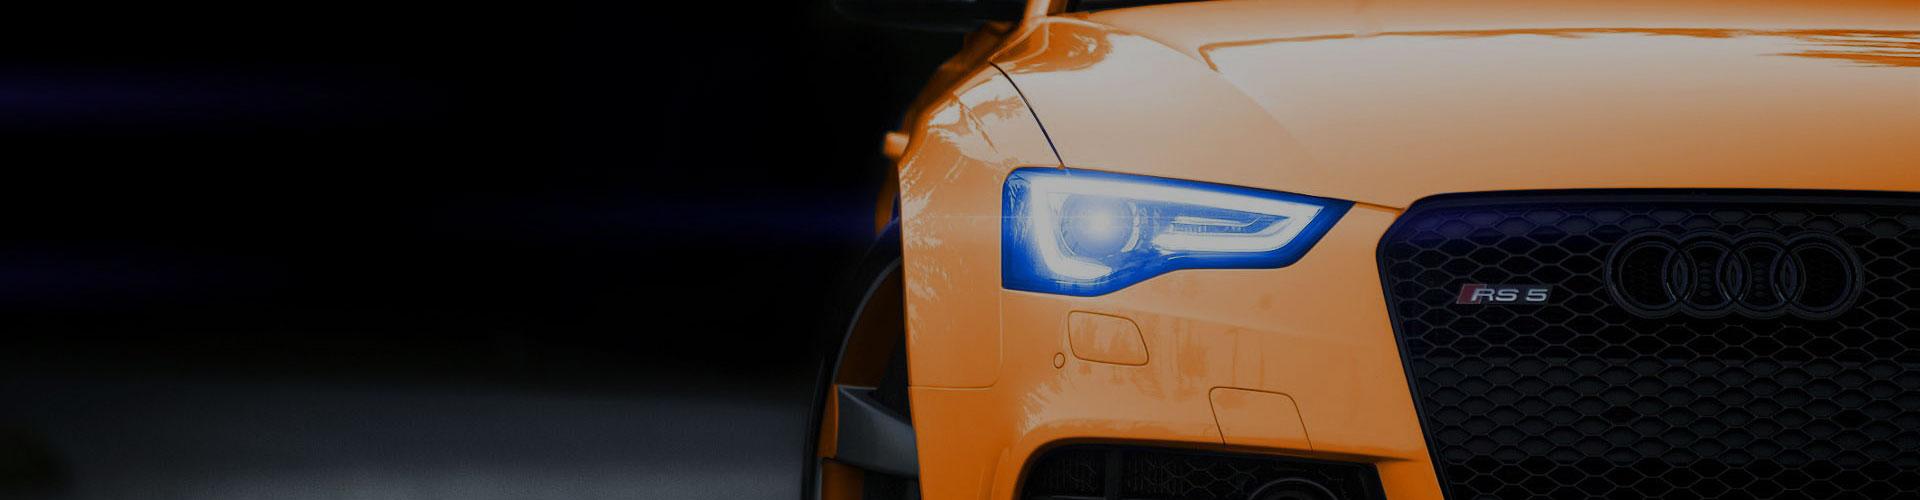 Audi Νέα Μοντέλα - Γ. Καψιώχας Α.Ε.Β.Ε. - Εξουσιοδοτημένος έμπορος Kosmokar